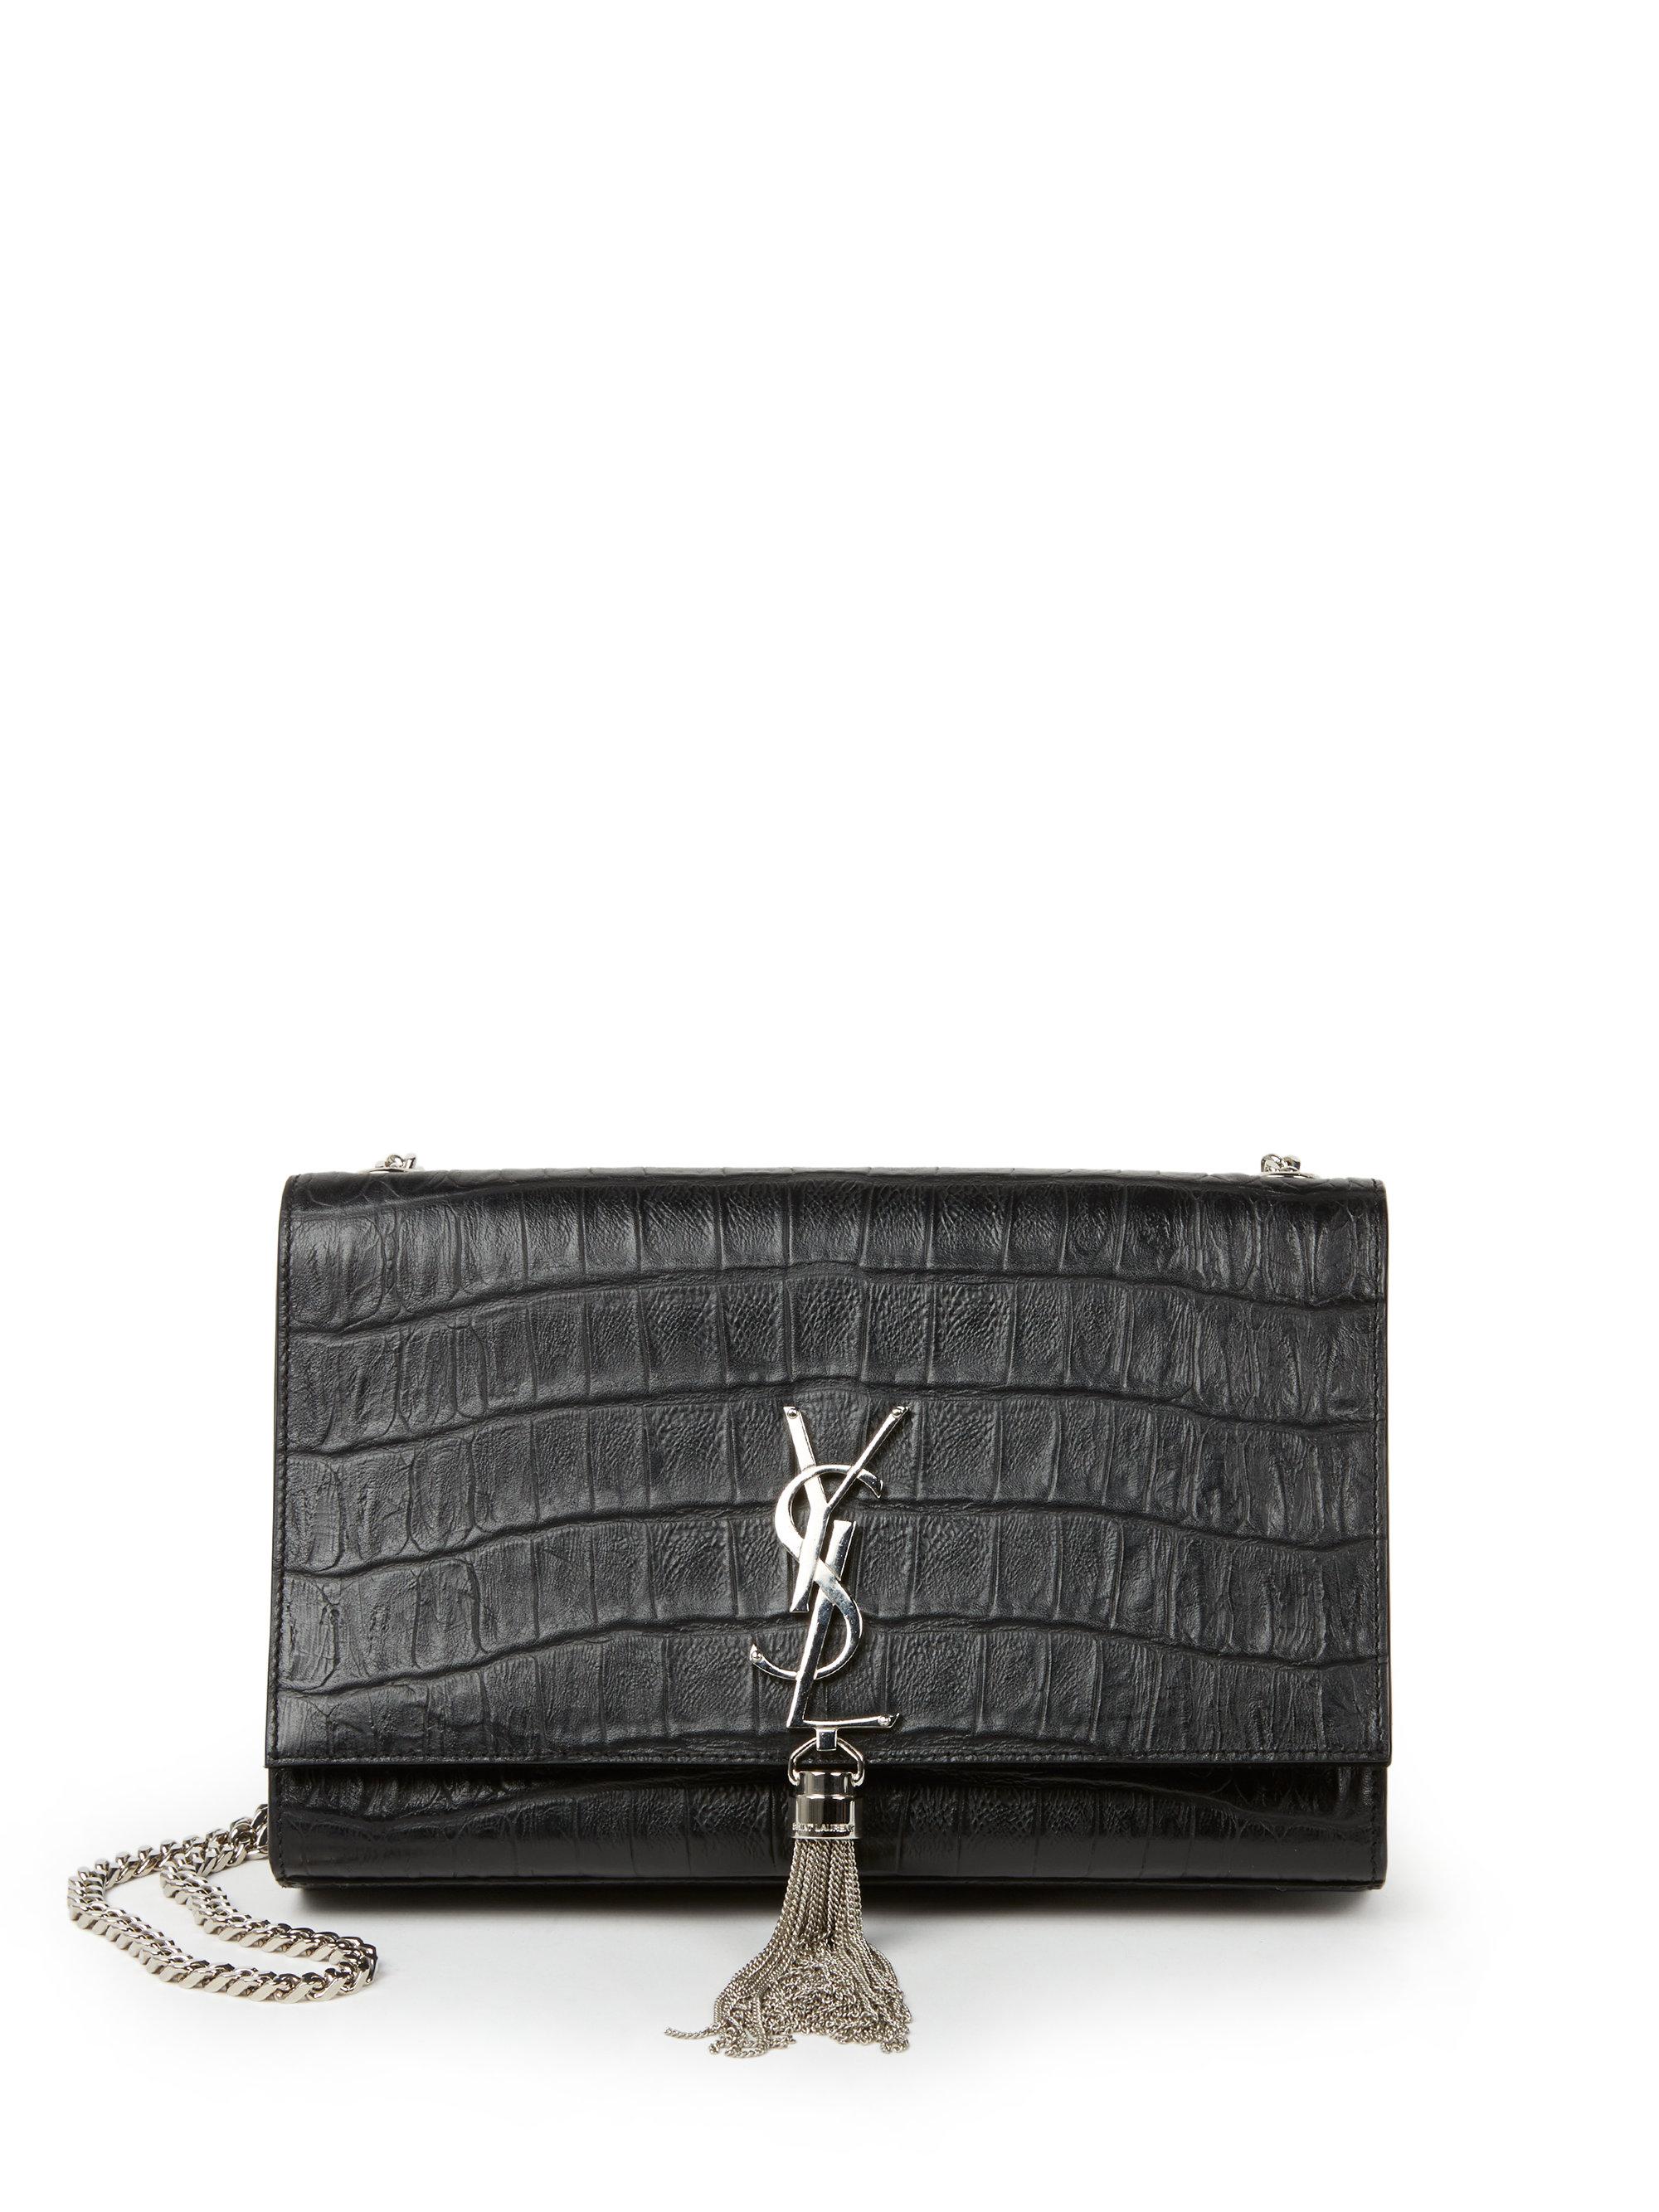 Lyst - Saint Laurent Monogram Medium Crocodile-embossed Leather ... 57c2b94bfb